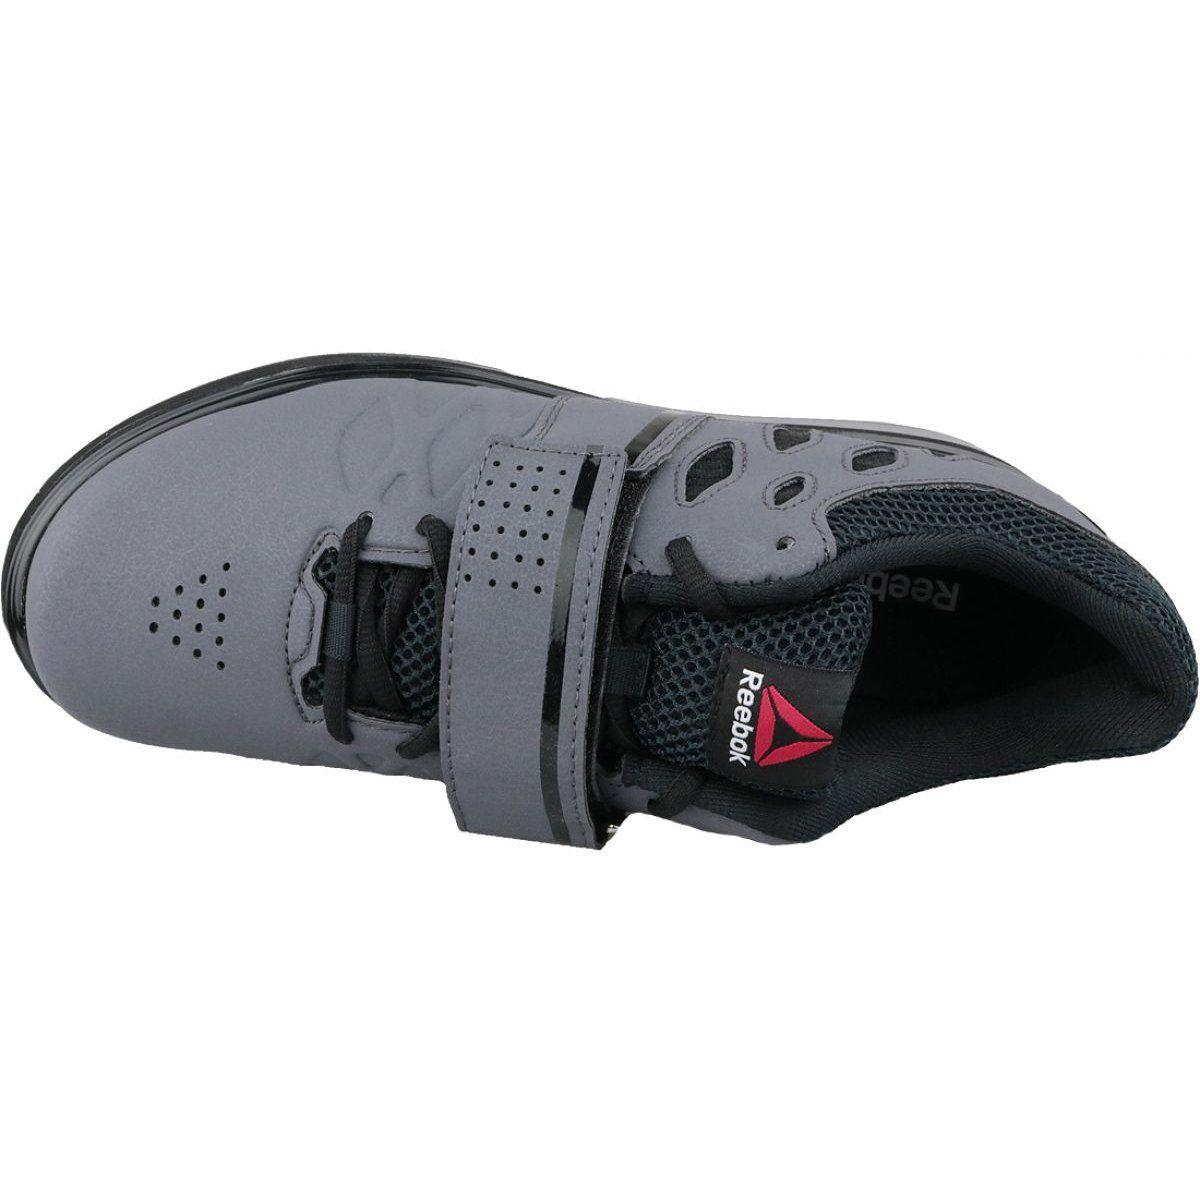 Buty Treningowe Reebok Lifter Pr M Bd2631 Szare Training Shoes Reebok Shoes